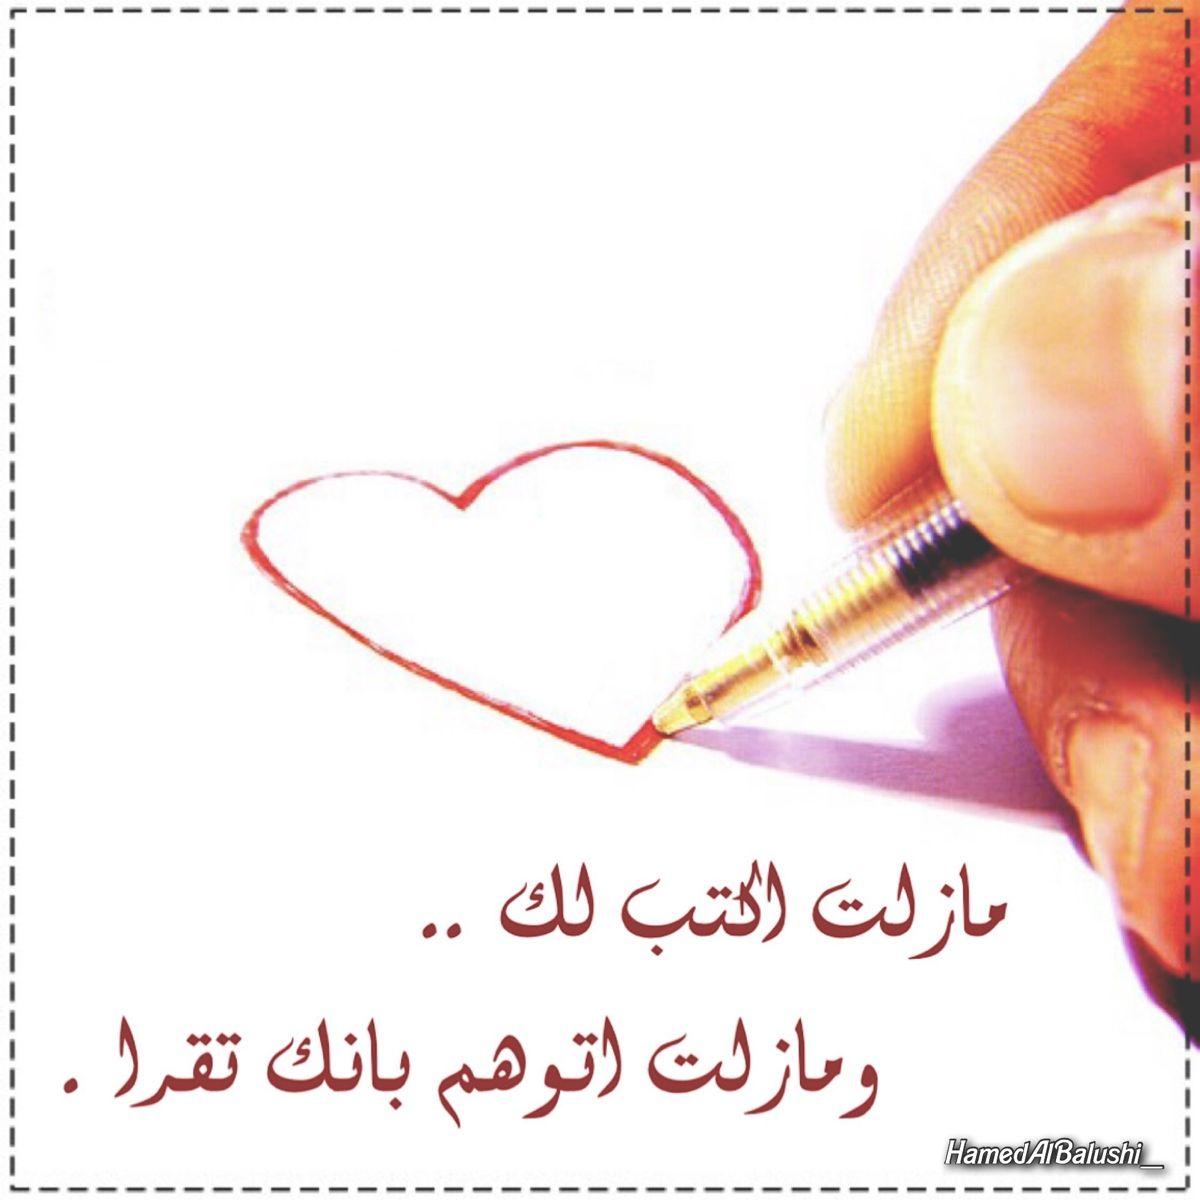 Pin By حمد البلوشي On الحب